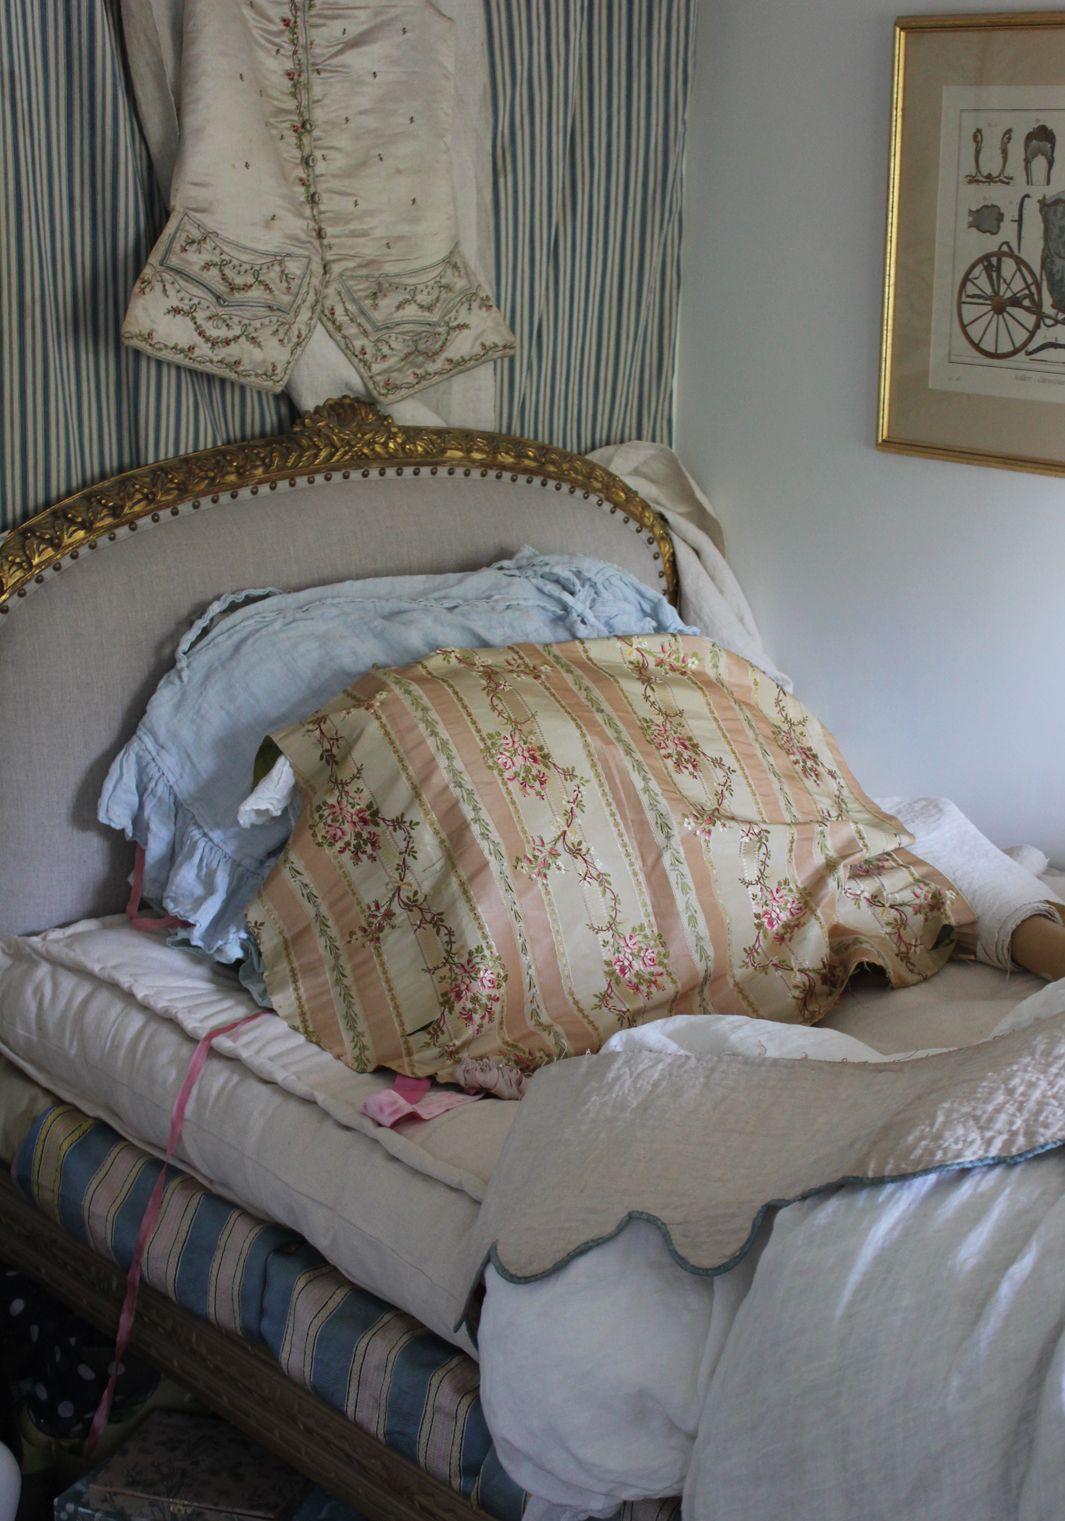 Vintage French Linens- 18th century peach stripe silk floral, blue & ecru mattress ticking: Trouvais.com